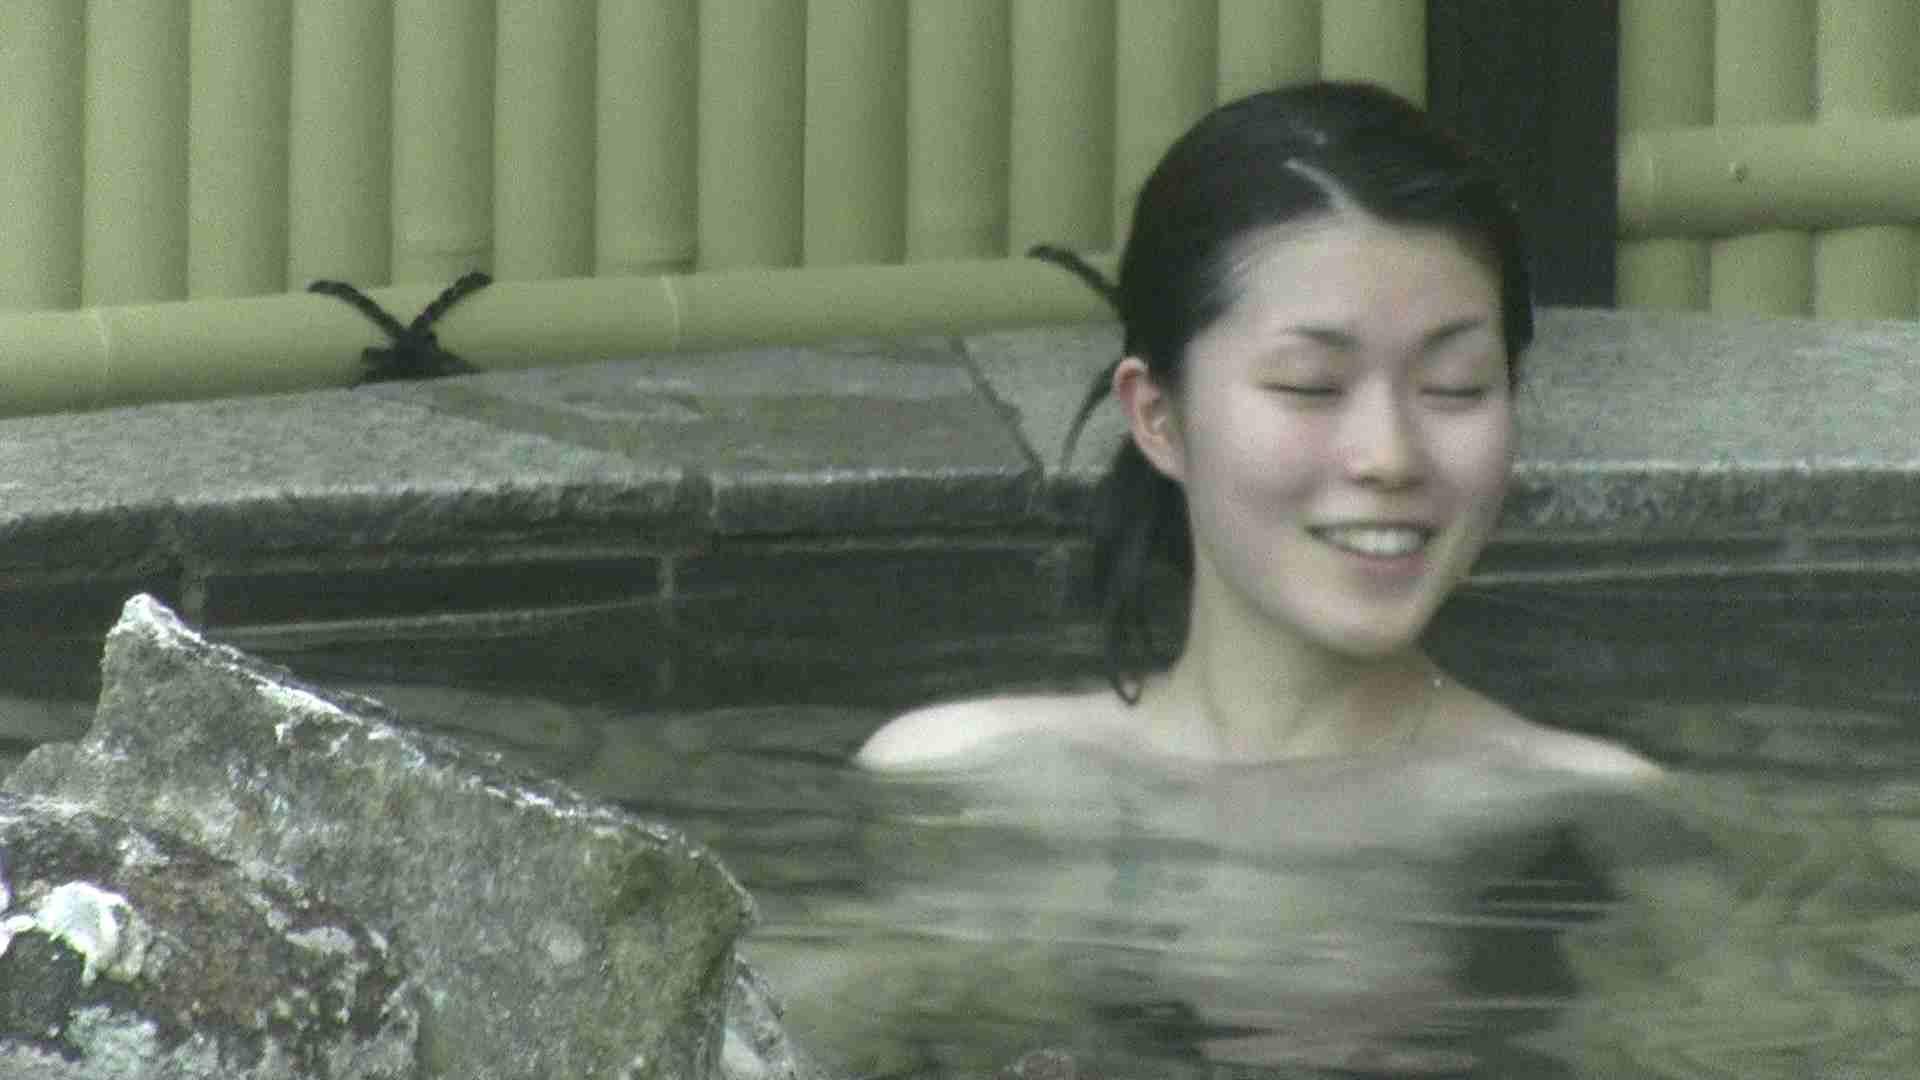 Aquaな露天風呂Vol.194 露天風呂編  110PIX 56